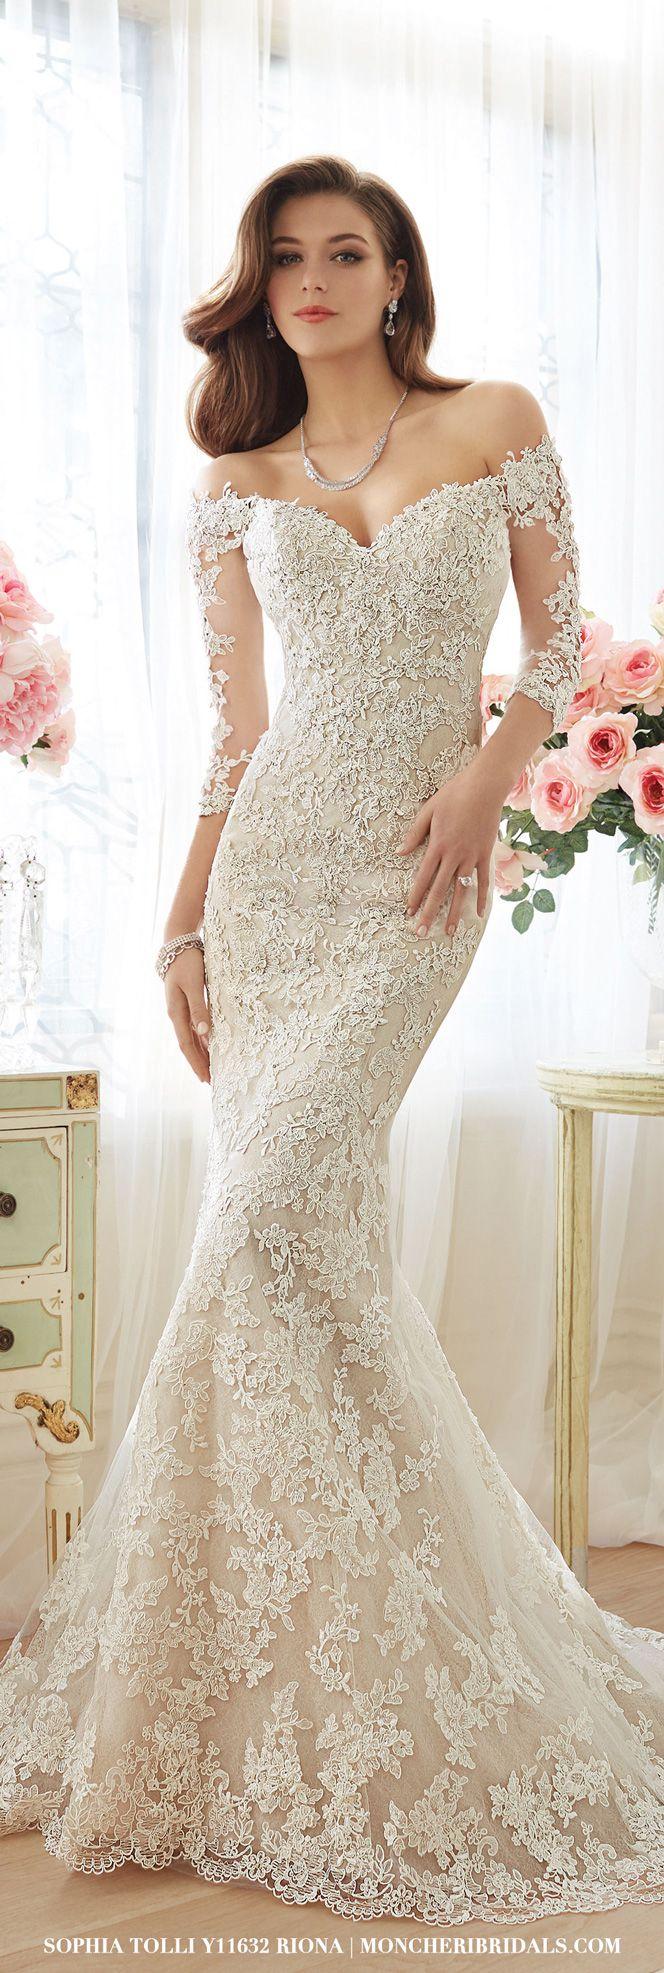 trumpet gown trumpet style wedding dress Y Riona Sexy Wedding DressesSpring